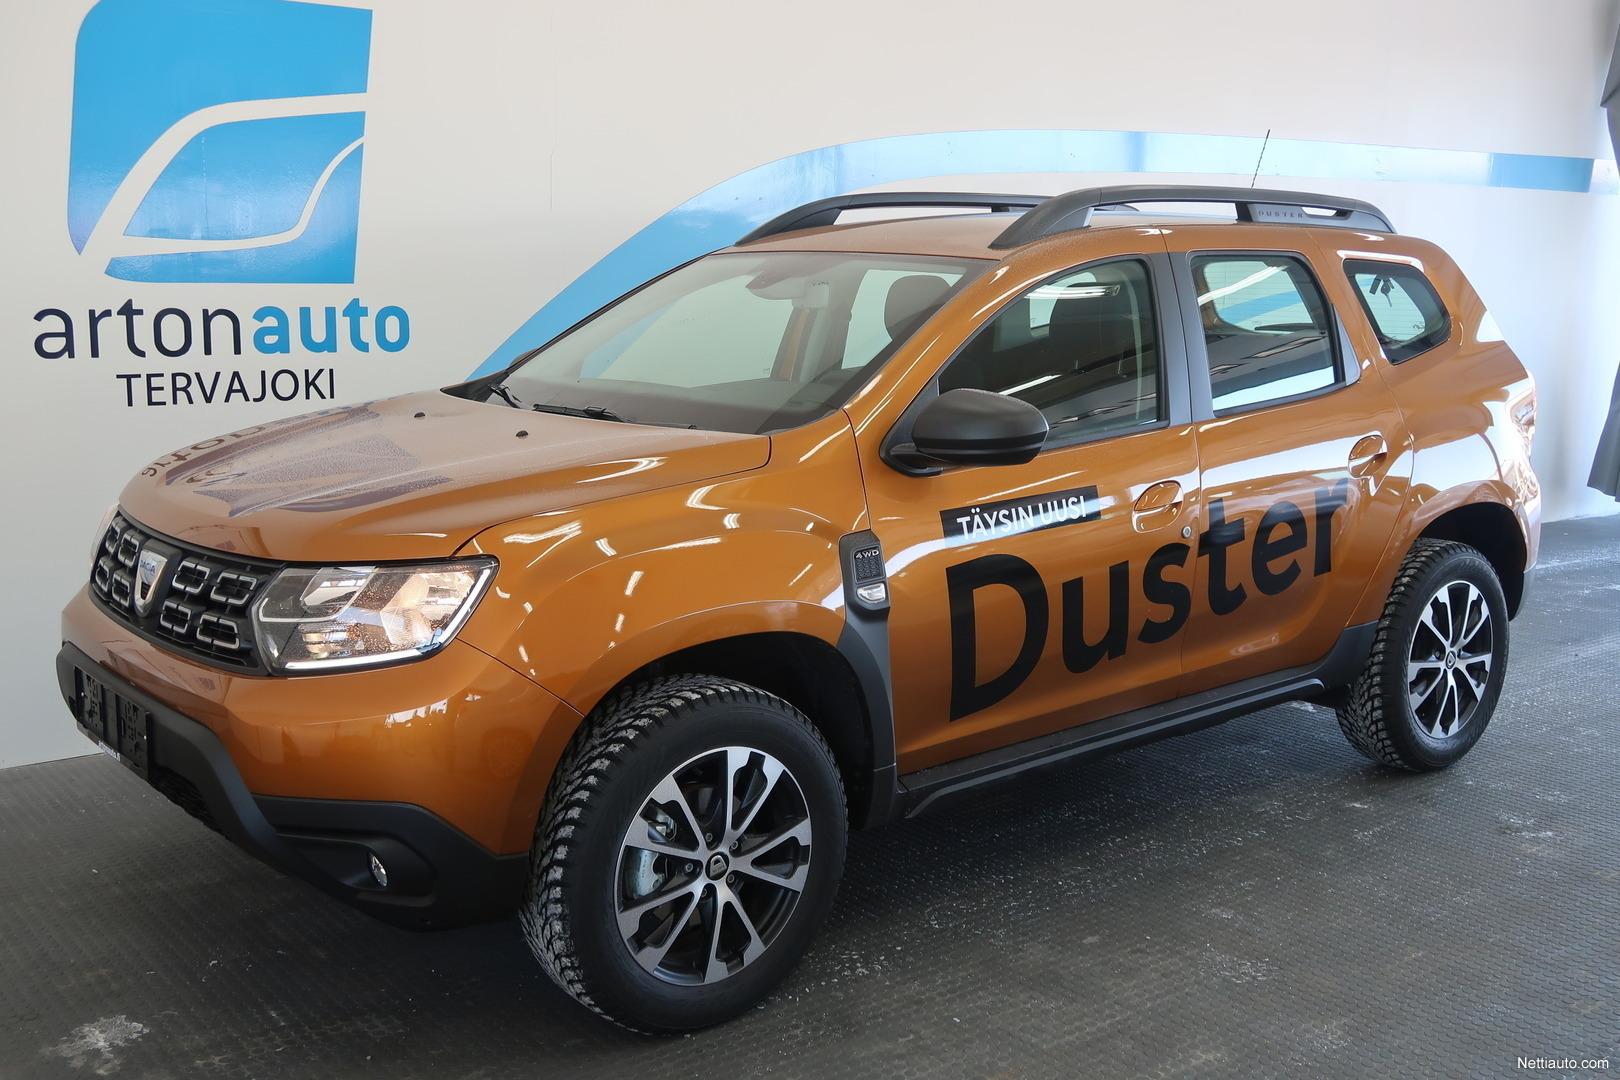 Dacia Duster Tekniset Tiedot